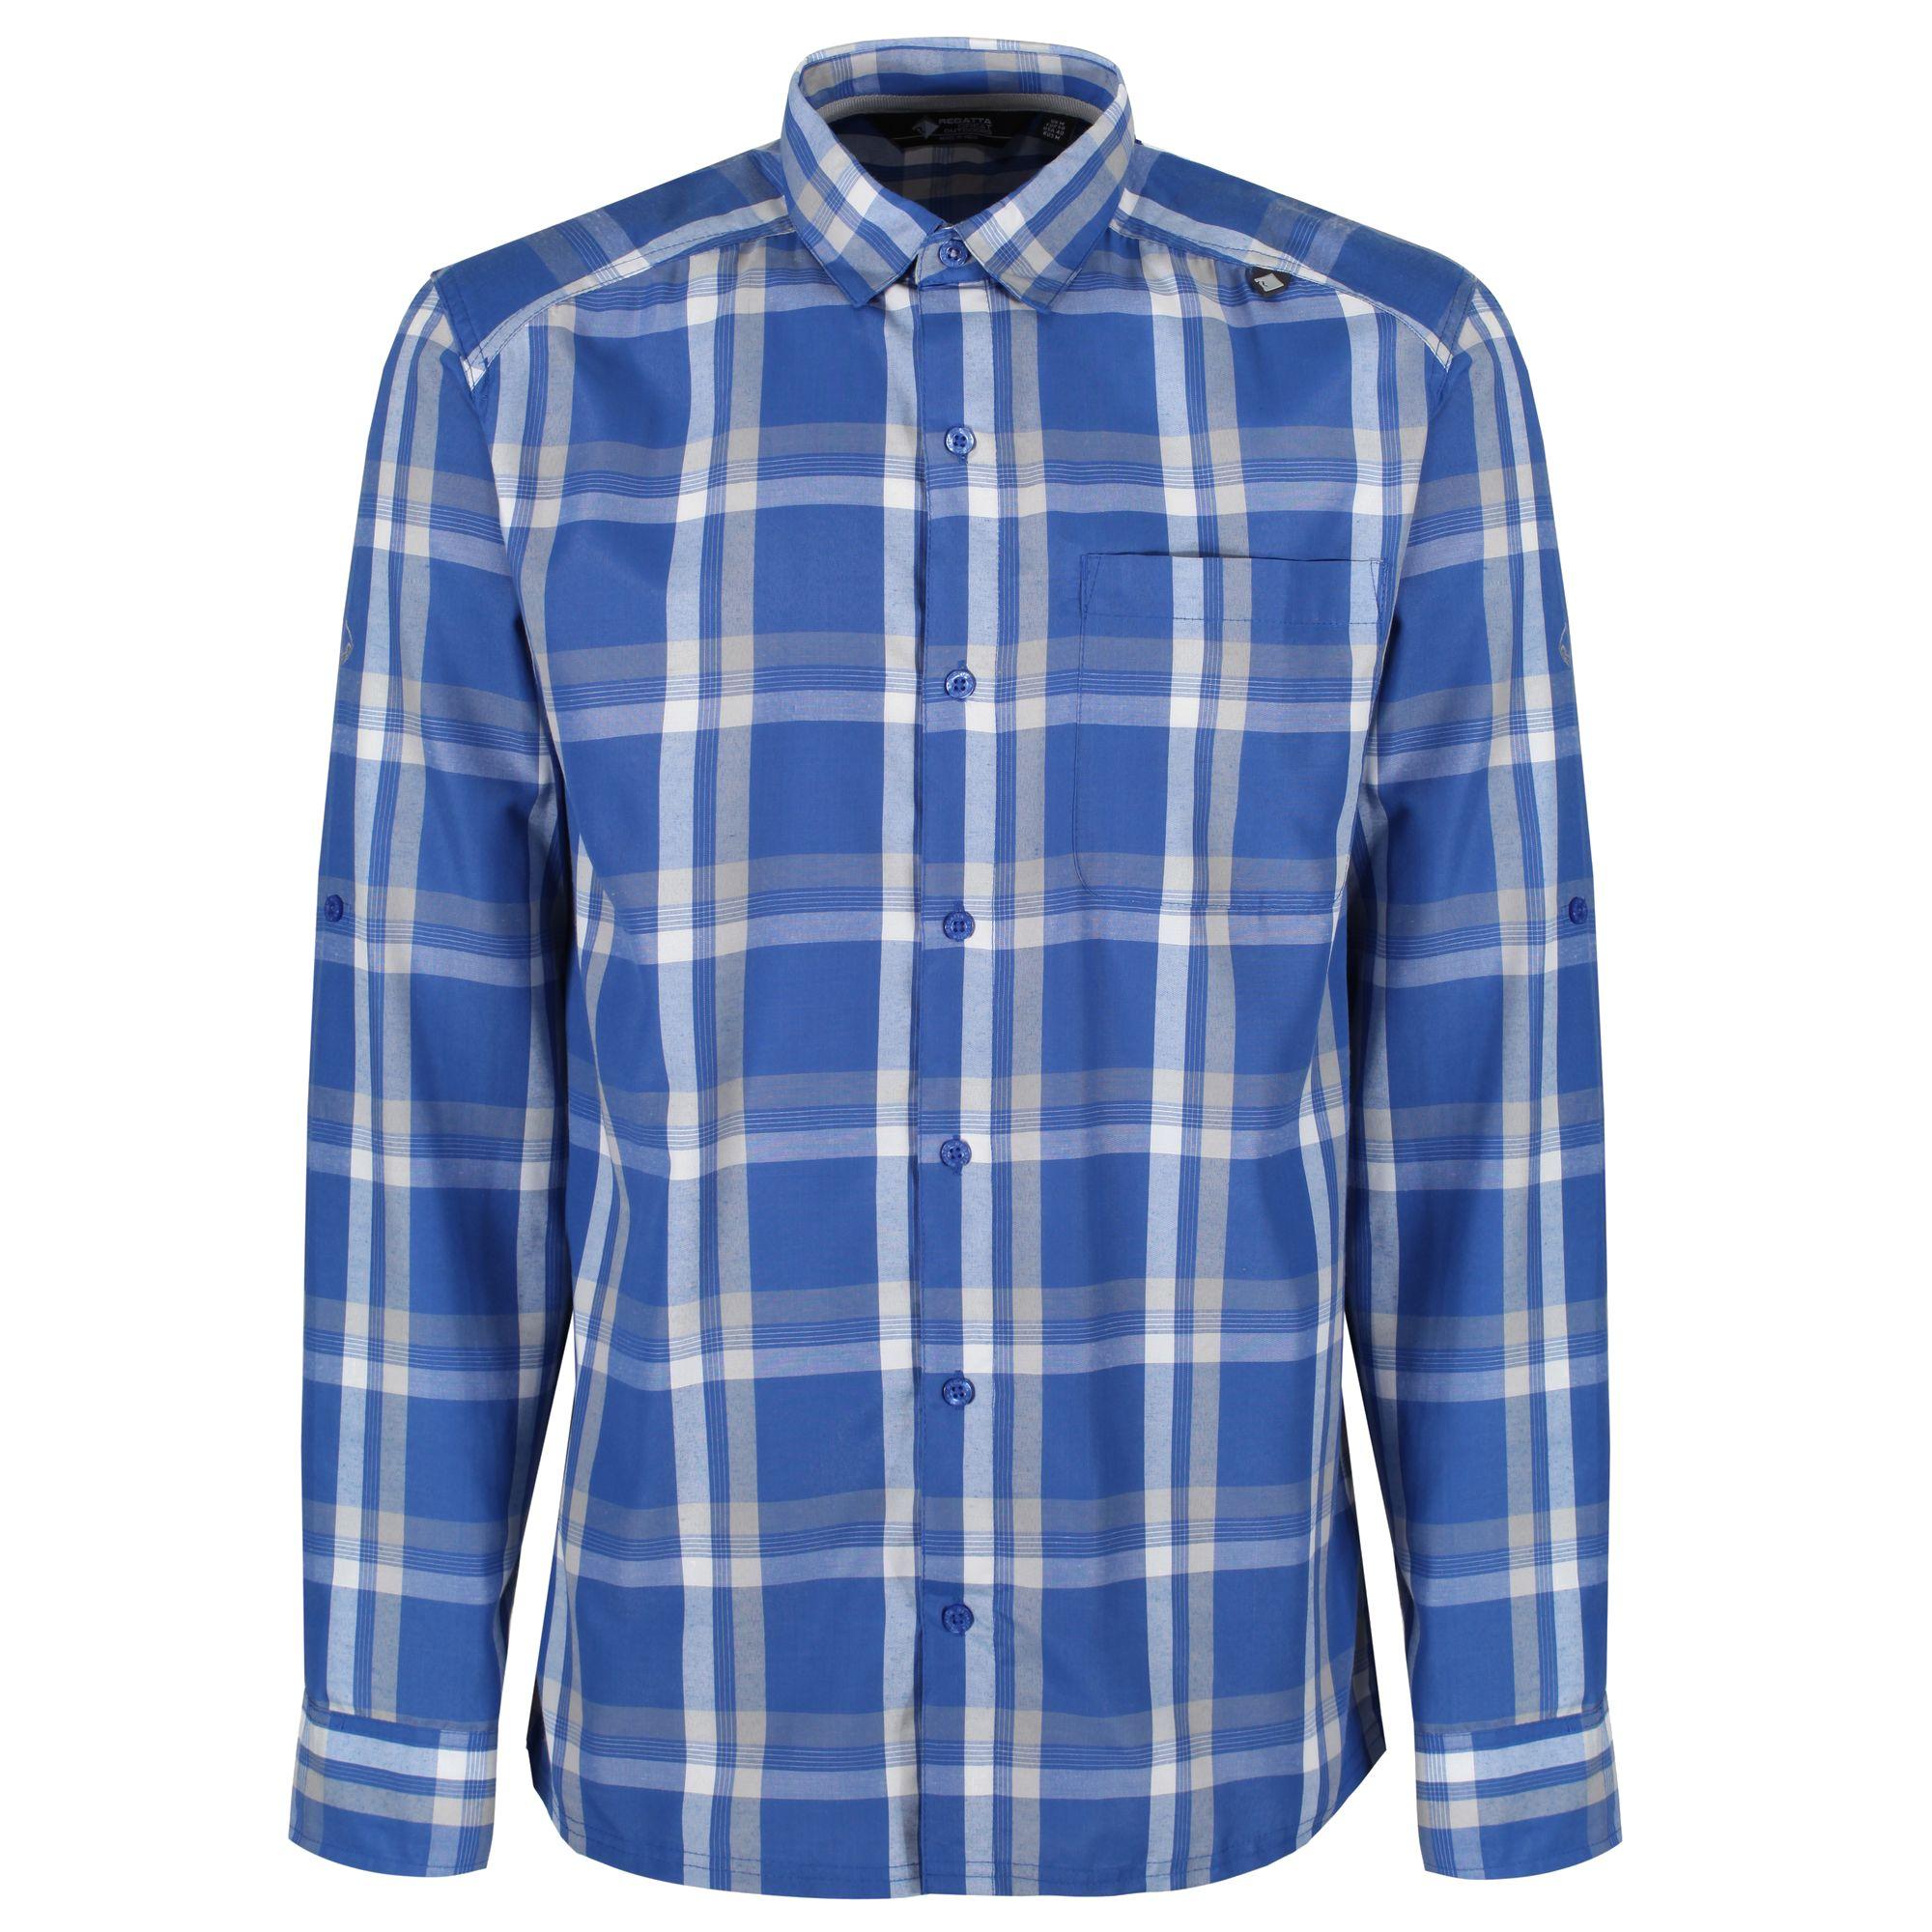 Regatta Mens Mindano Checked Long Sleeve Shirt